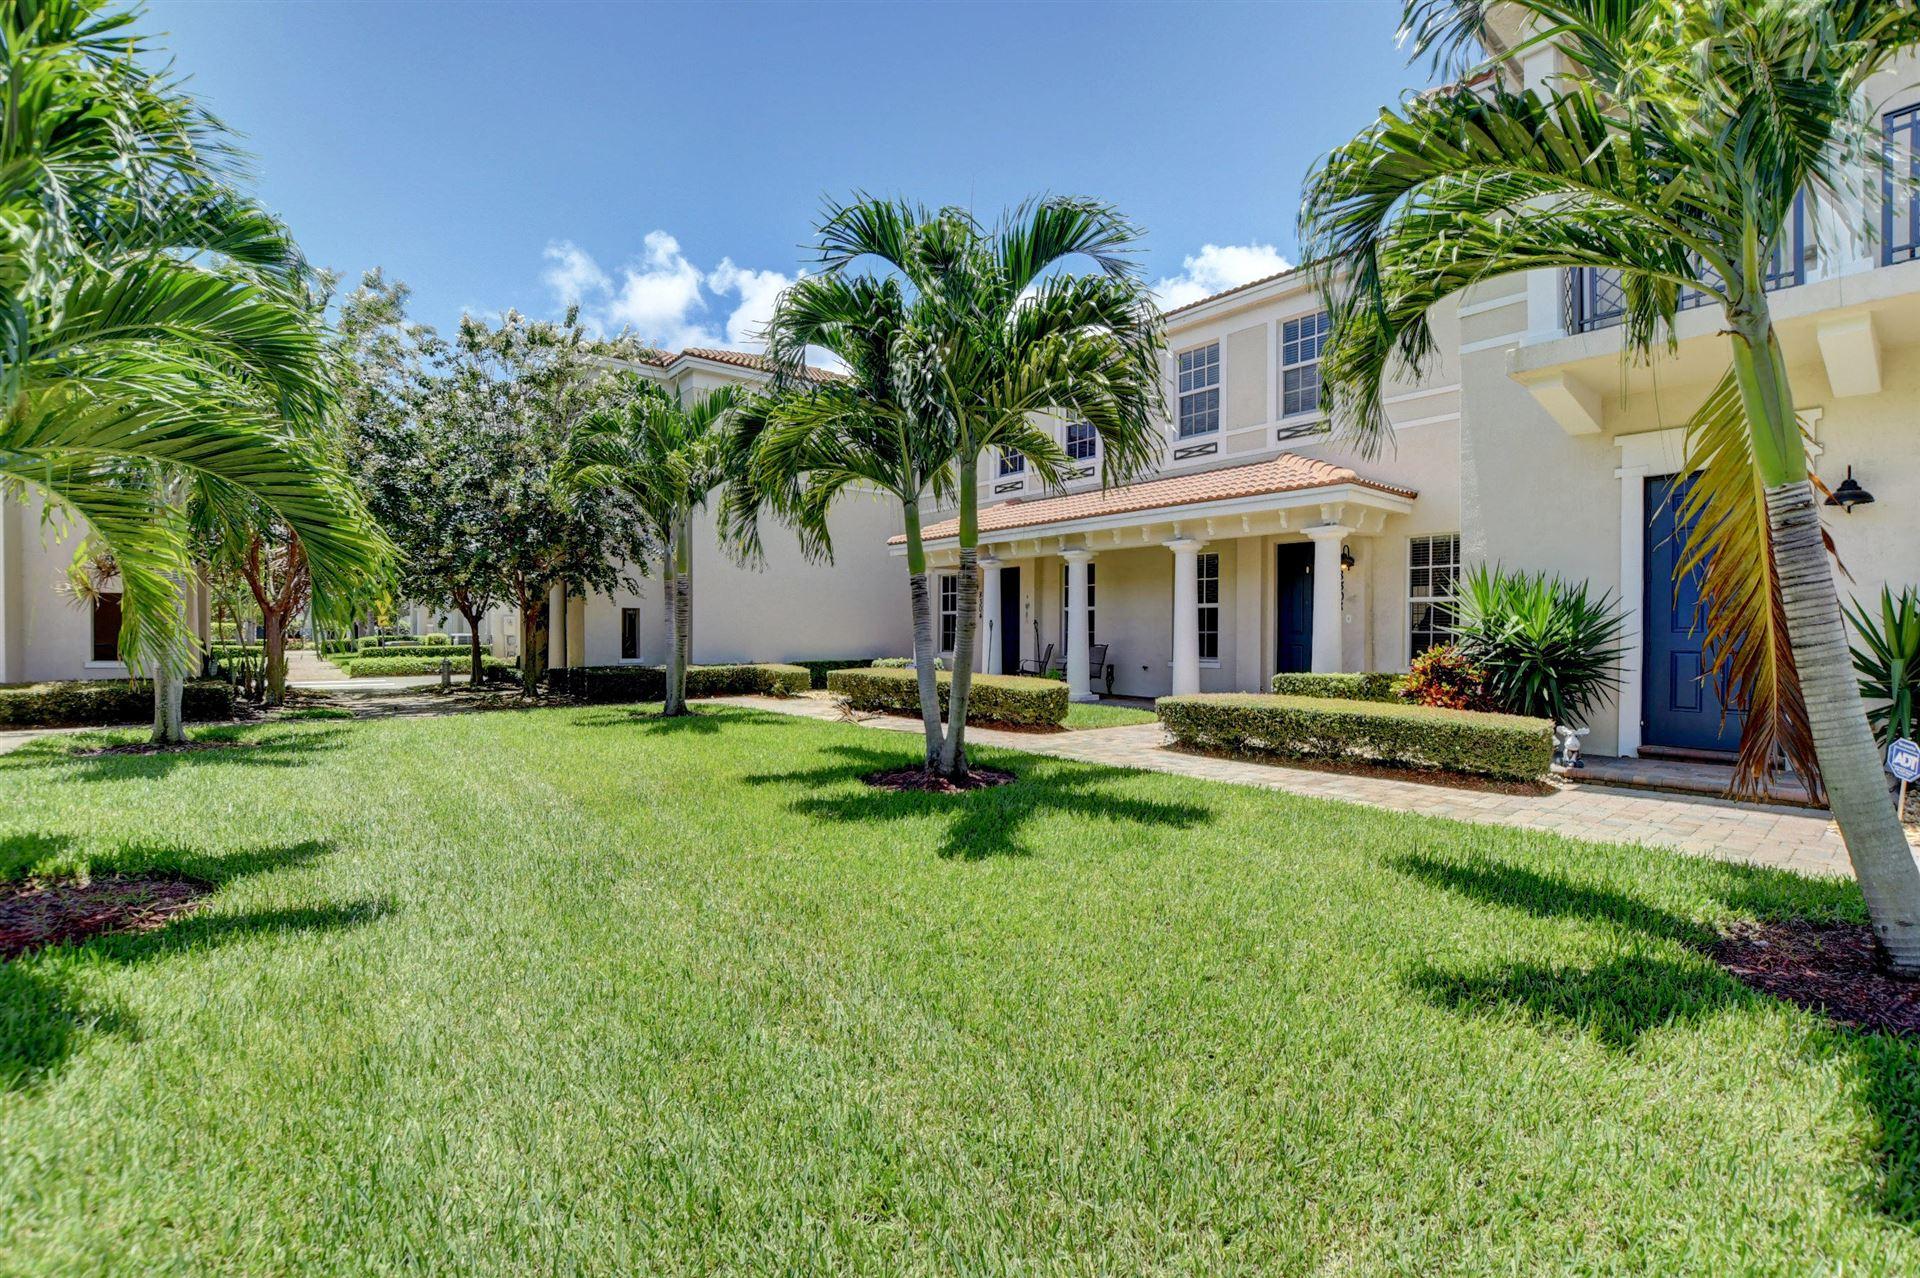 8308 NW 8th Way, Boca Raton, FL 33487 - MLS#: RX-10734420